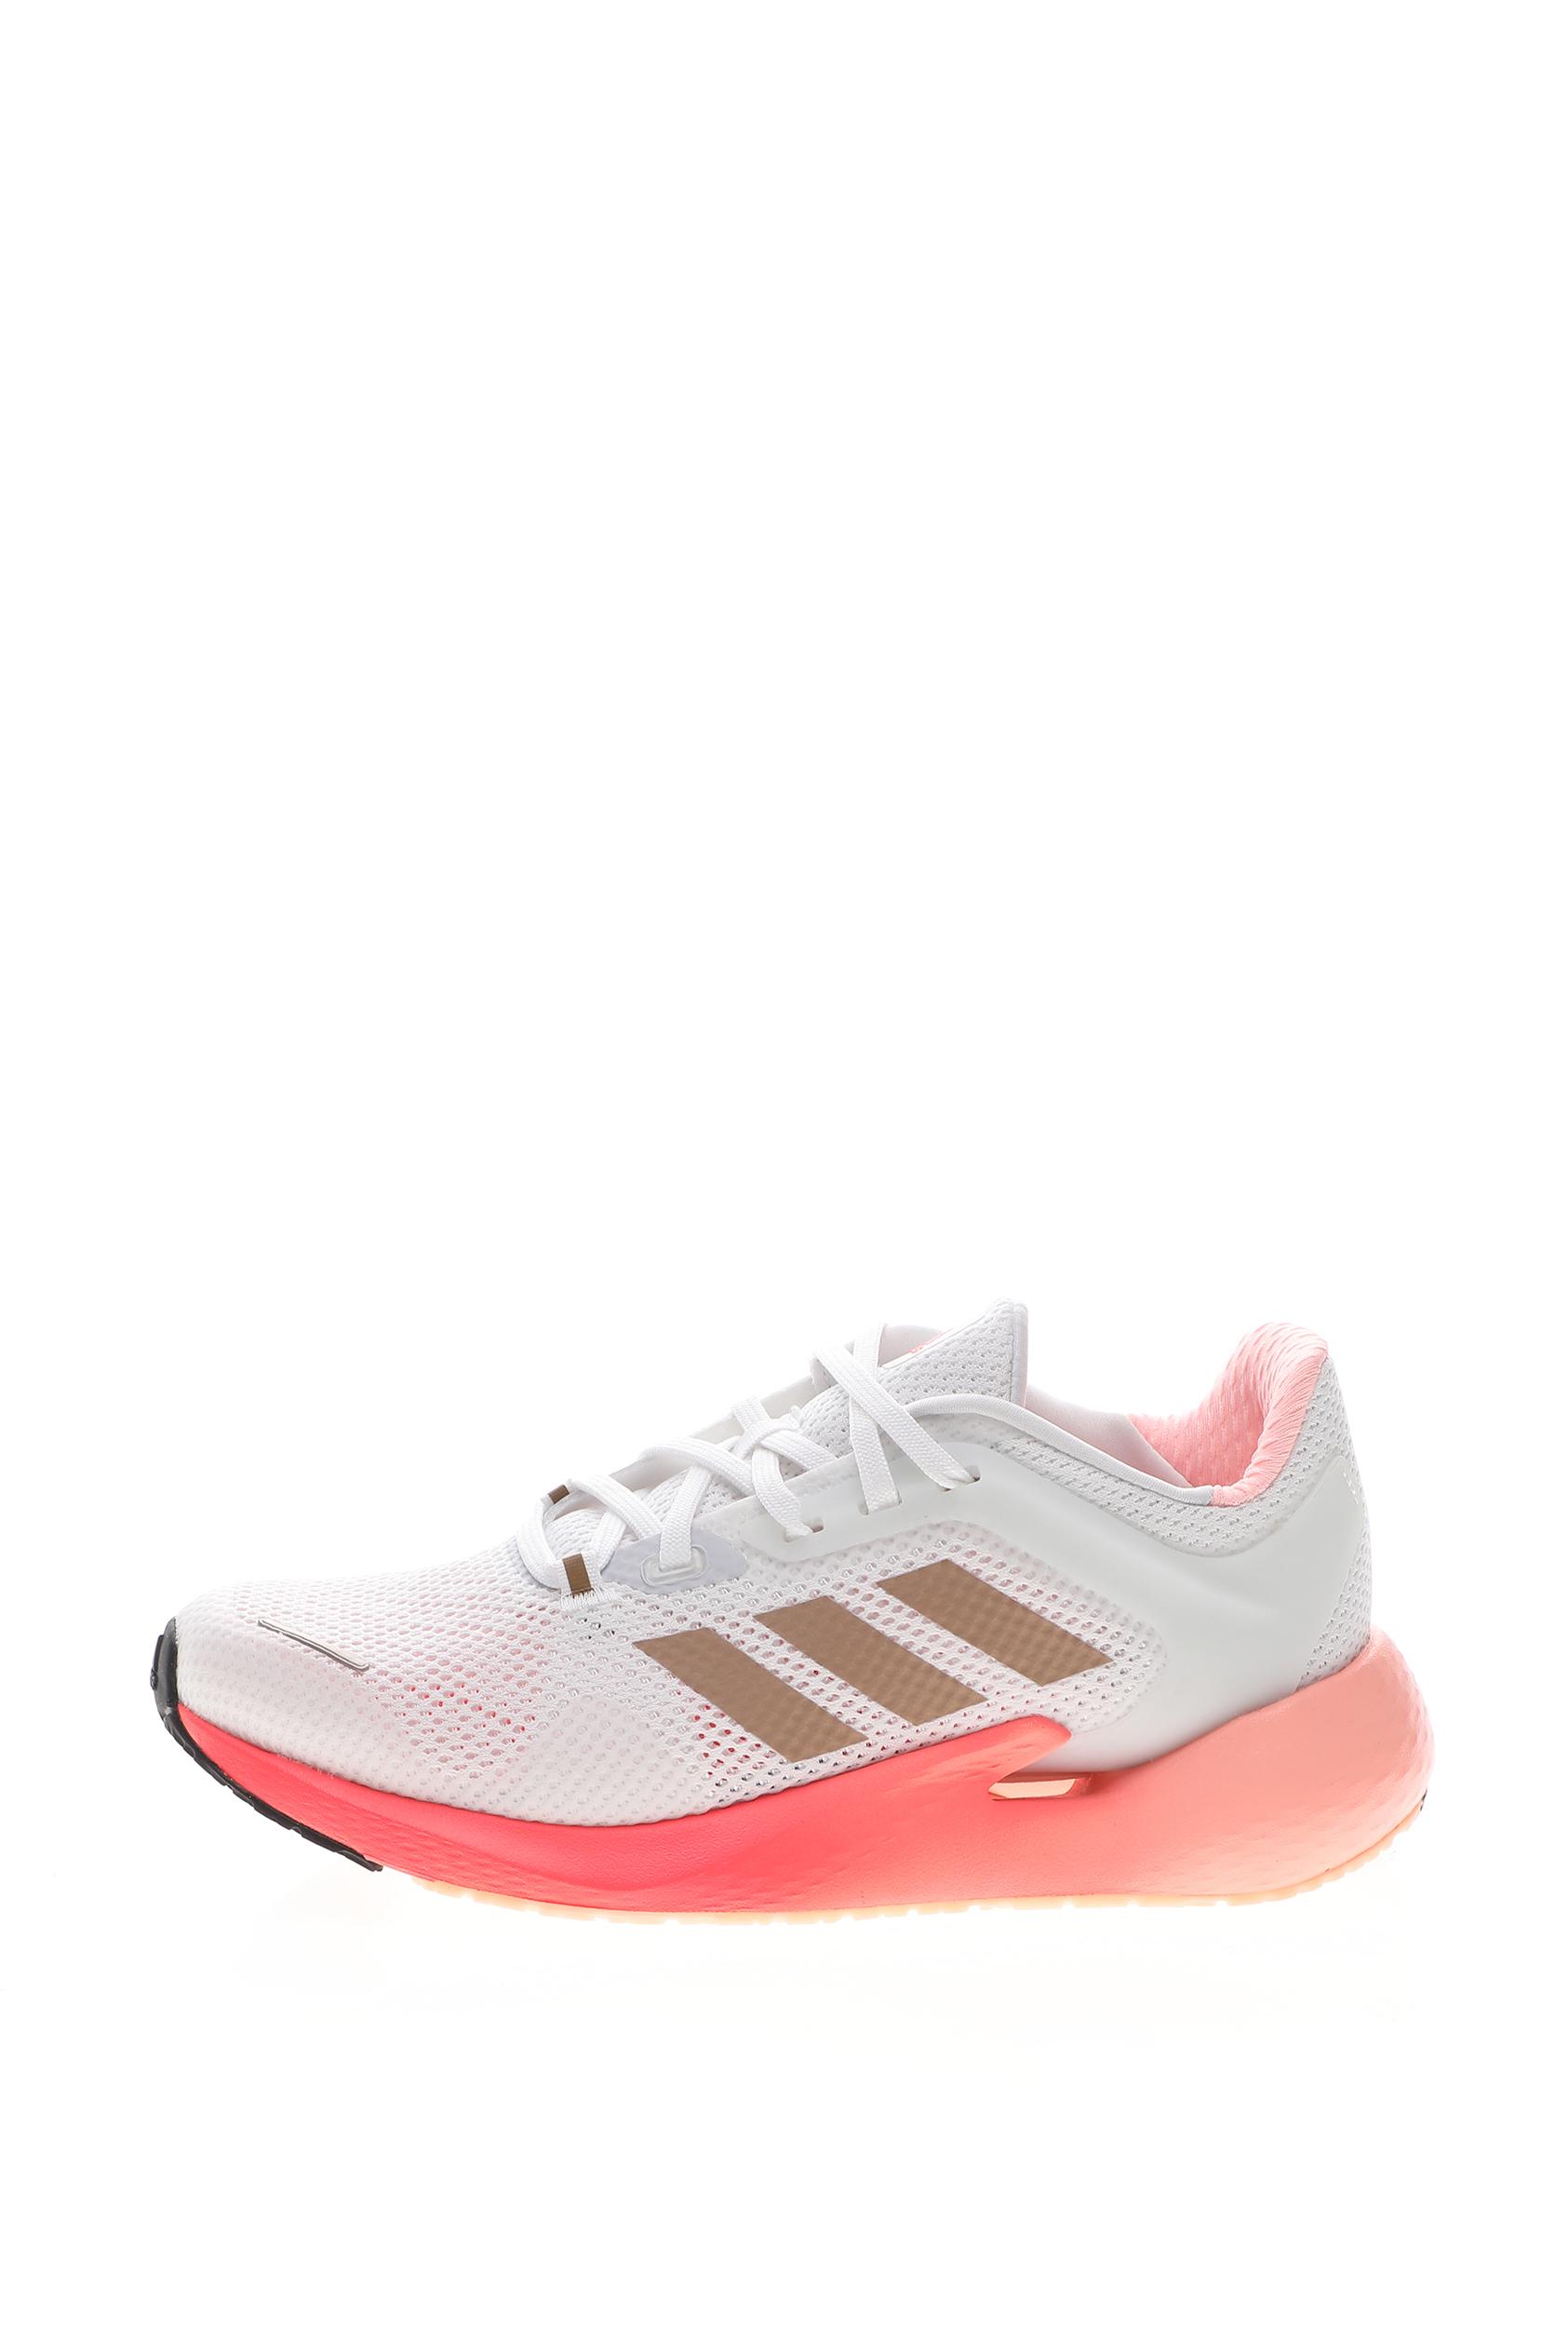 adidas Originals – Γυναικεία παπούτσια running adidas Originals ALPHATORSION λευκά